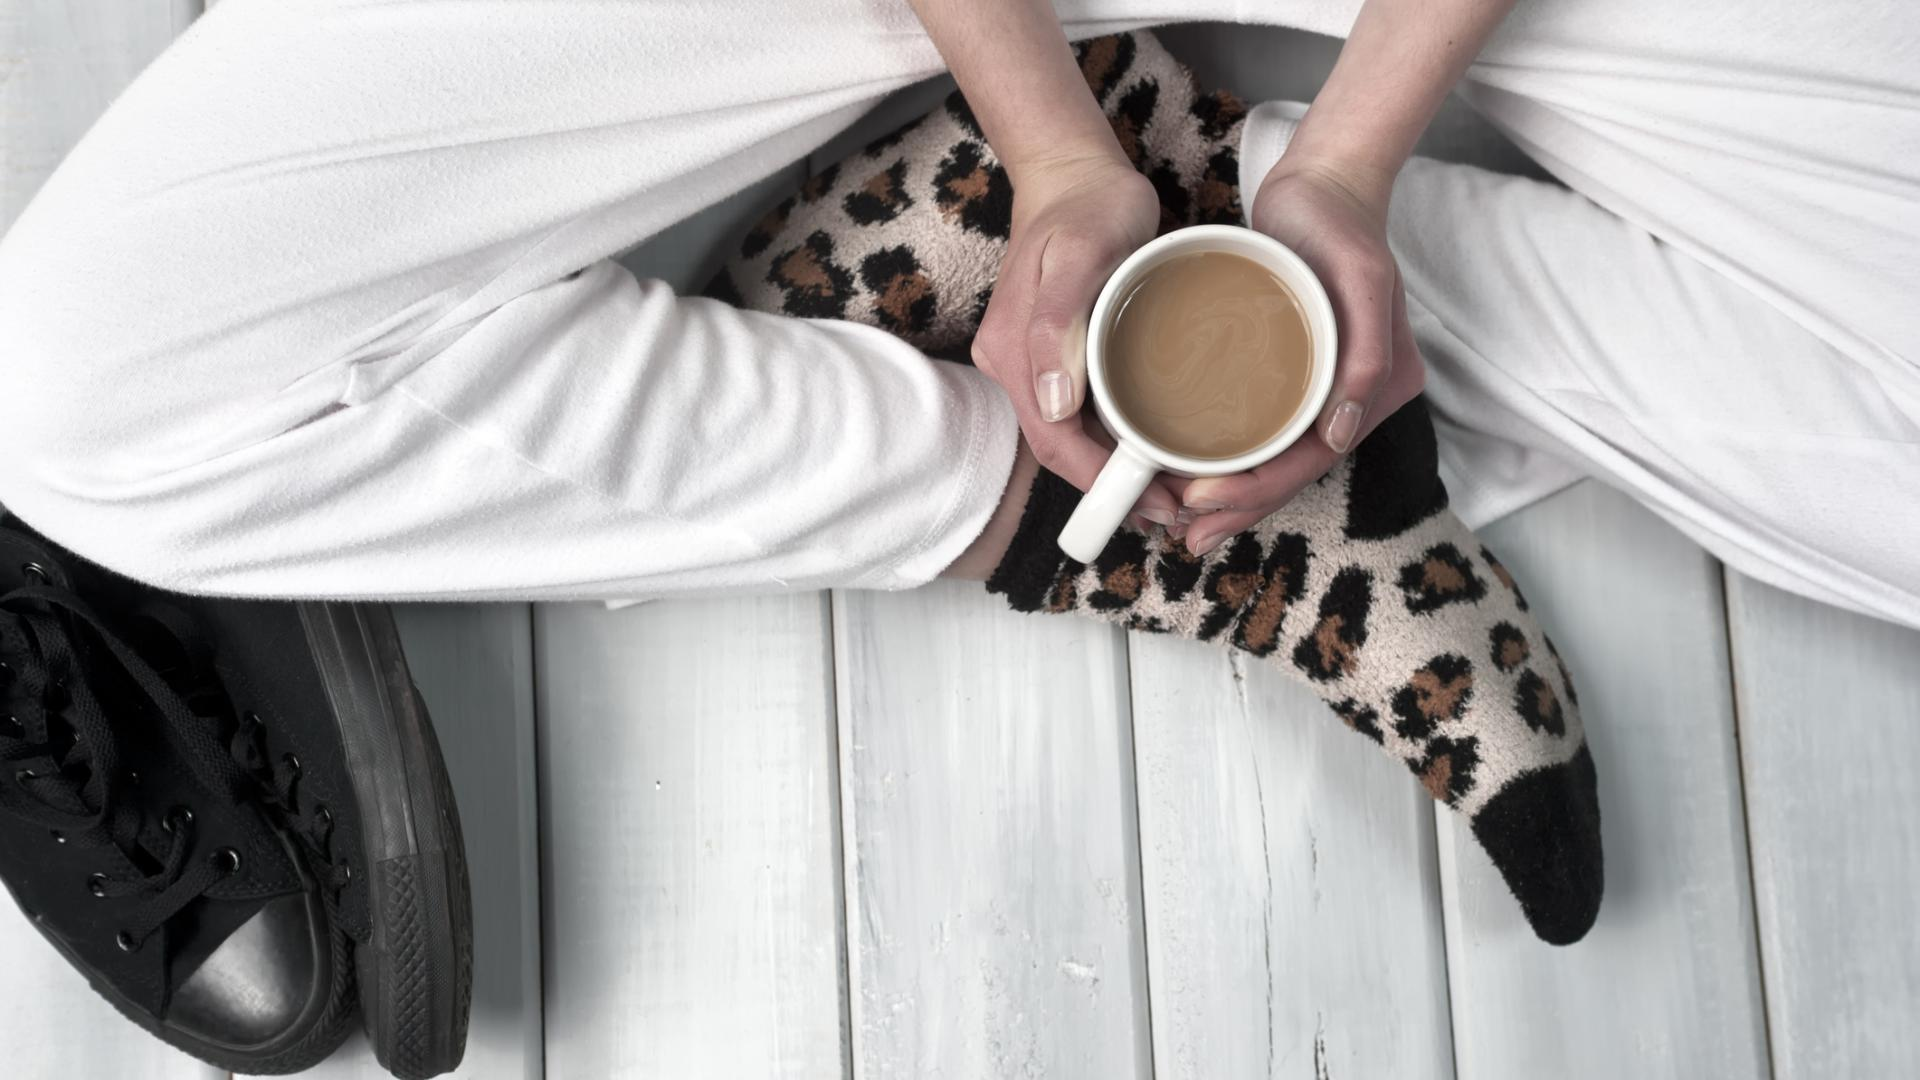 Jogginghose Kuschelsocken Kaffee chillen